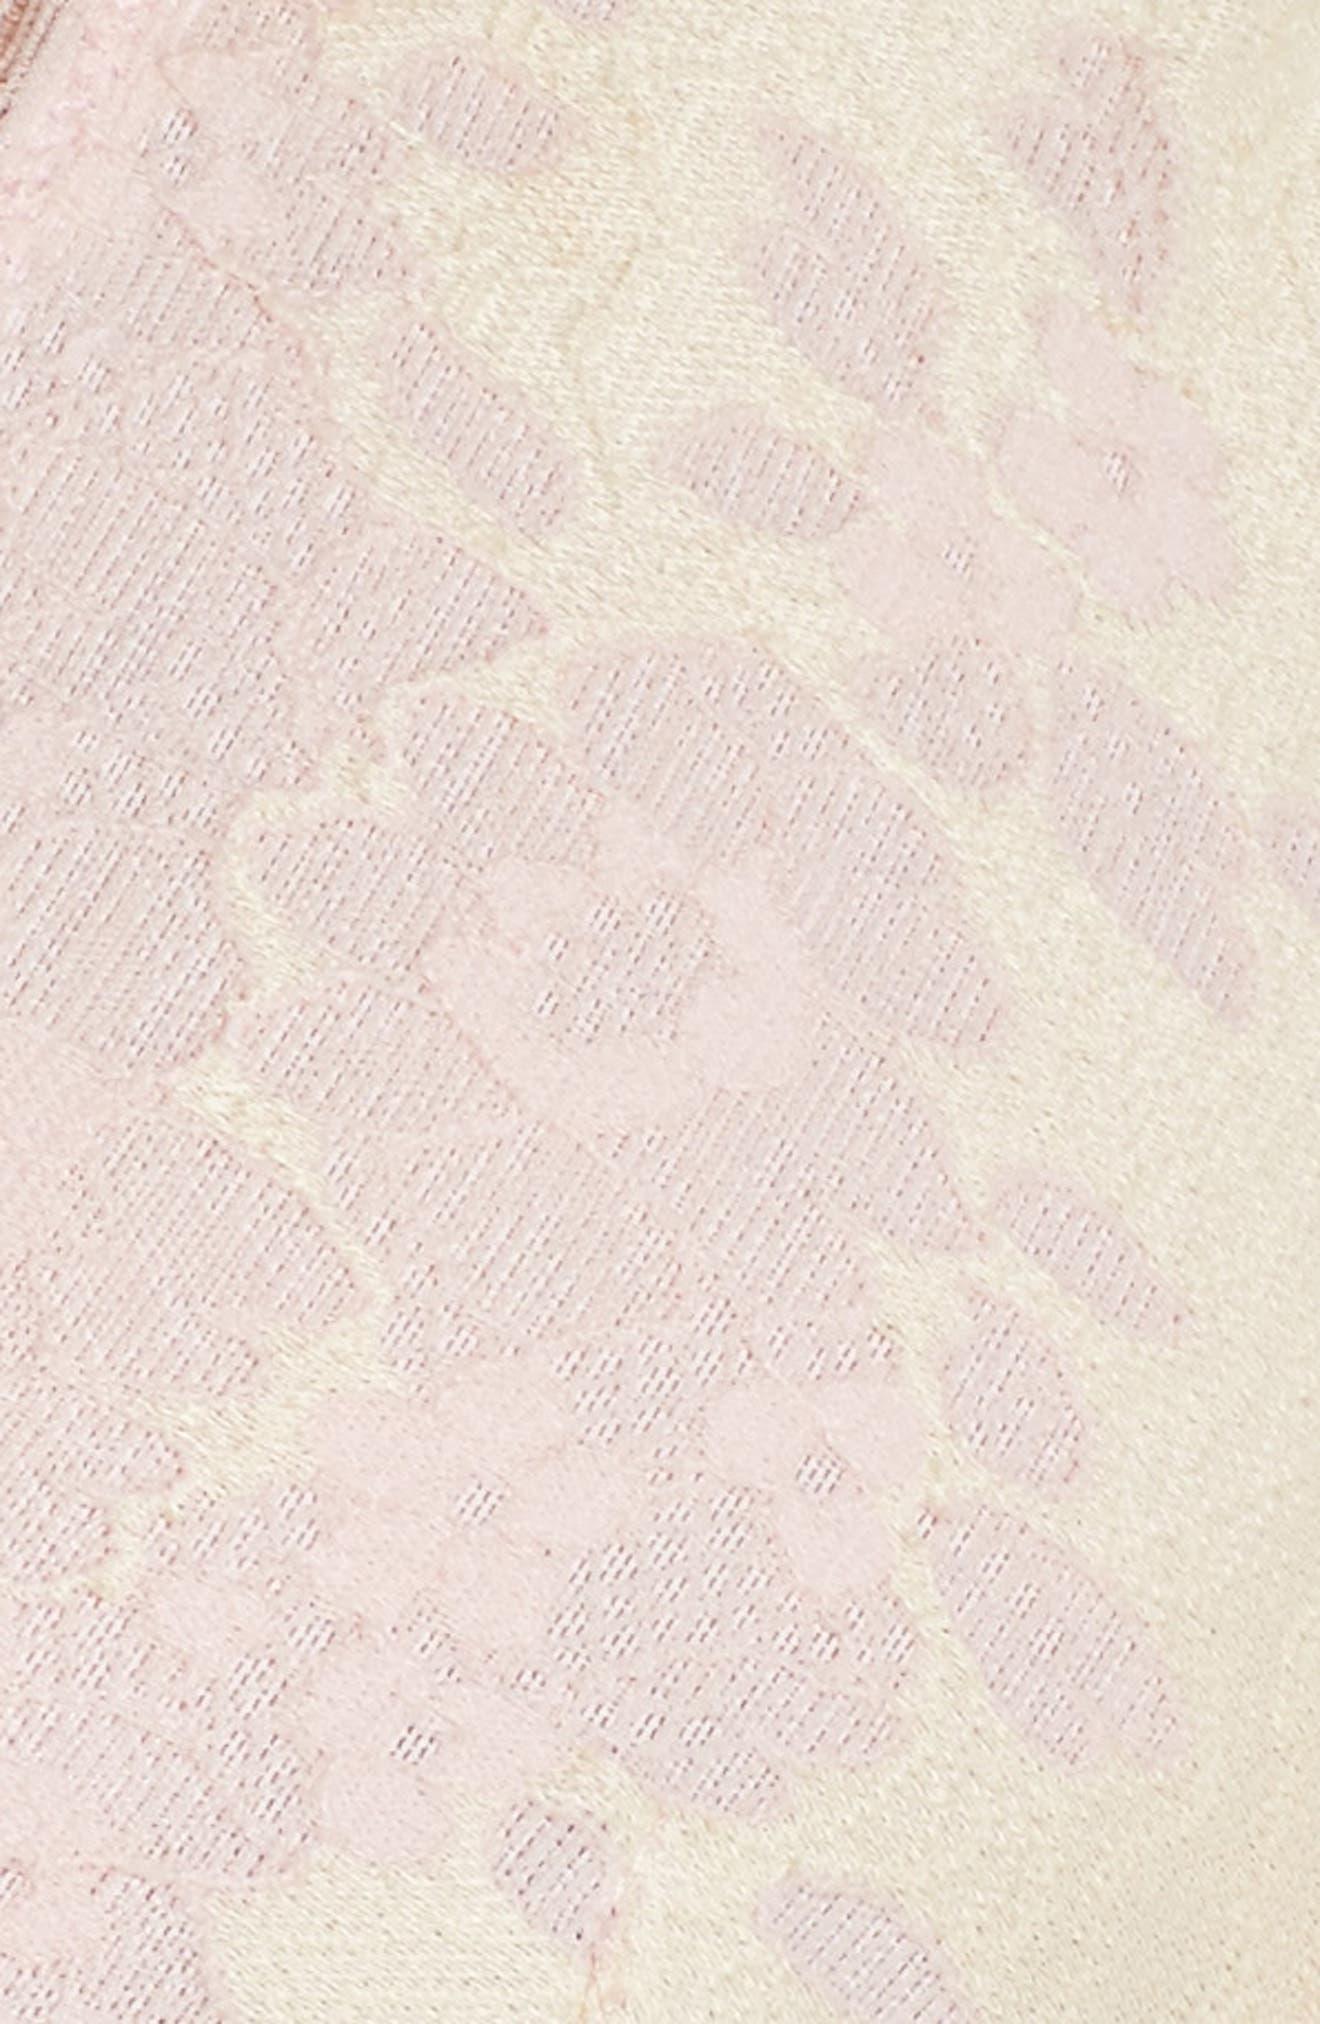 Italia Bralette,                             Alternate thumbnail 10, color,                             Rose Dawn/ Sunrise Yellow